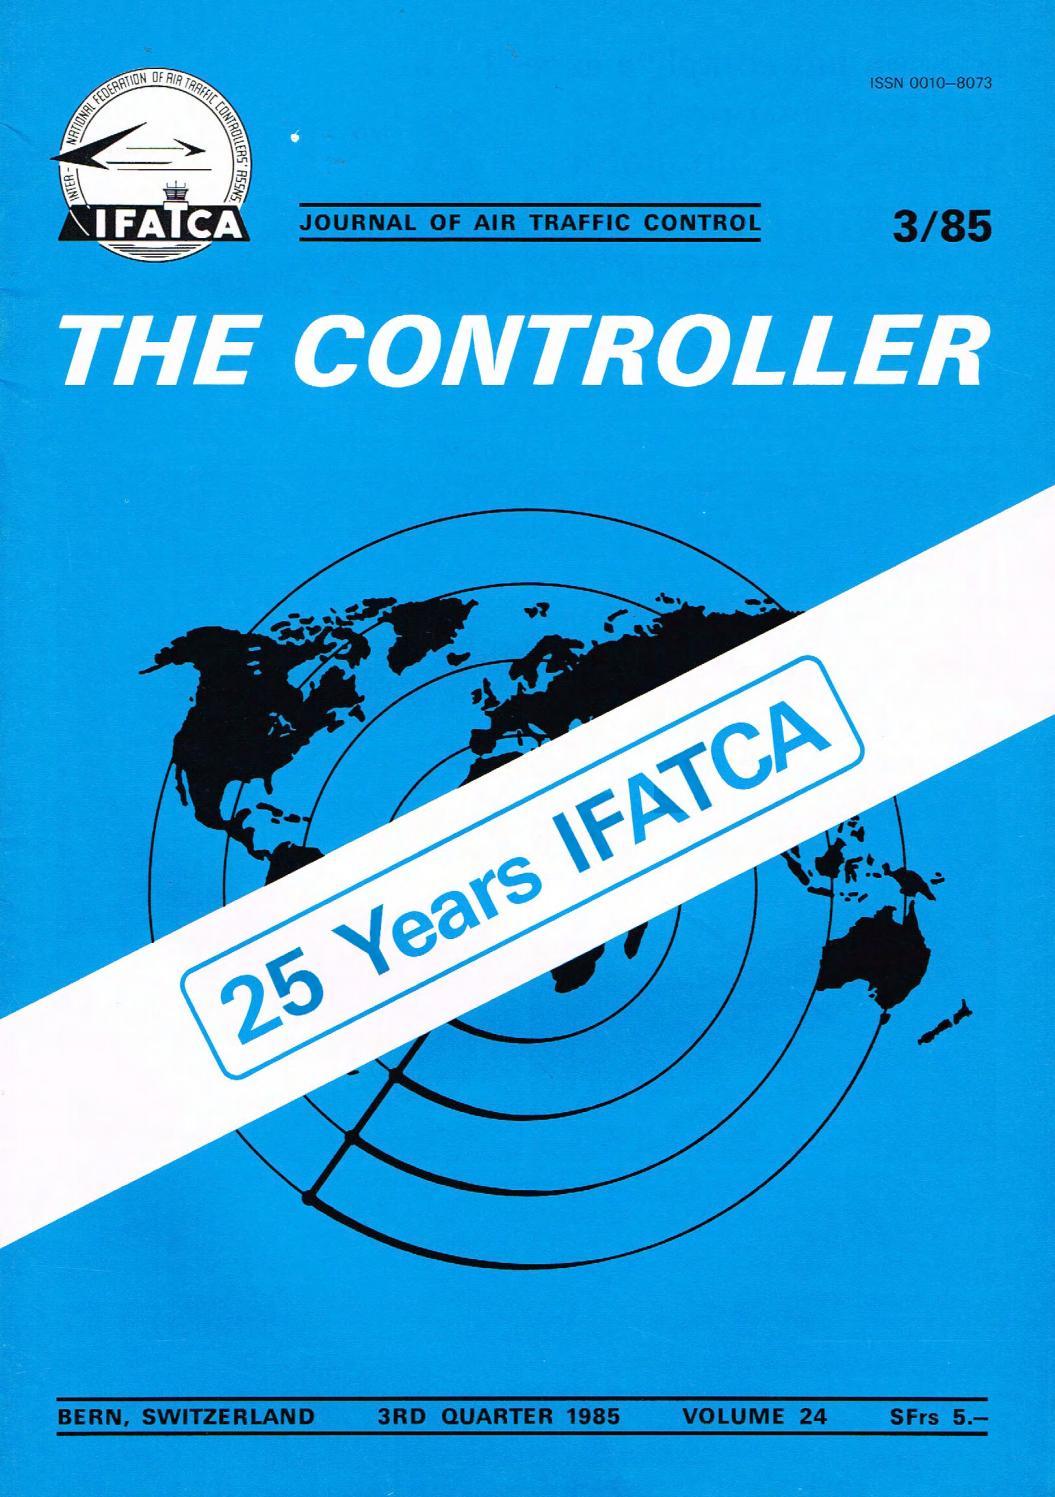 IFATCA The Controller - 3rd Quarter 1985 by IFATCA - issuu